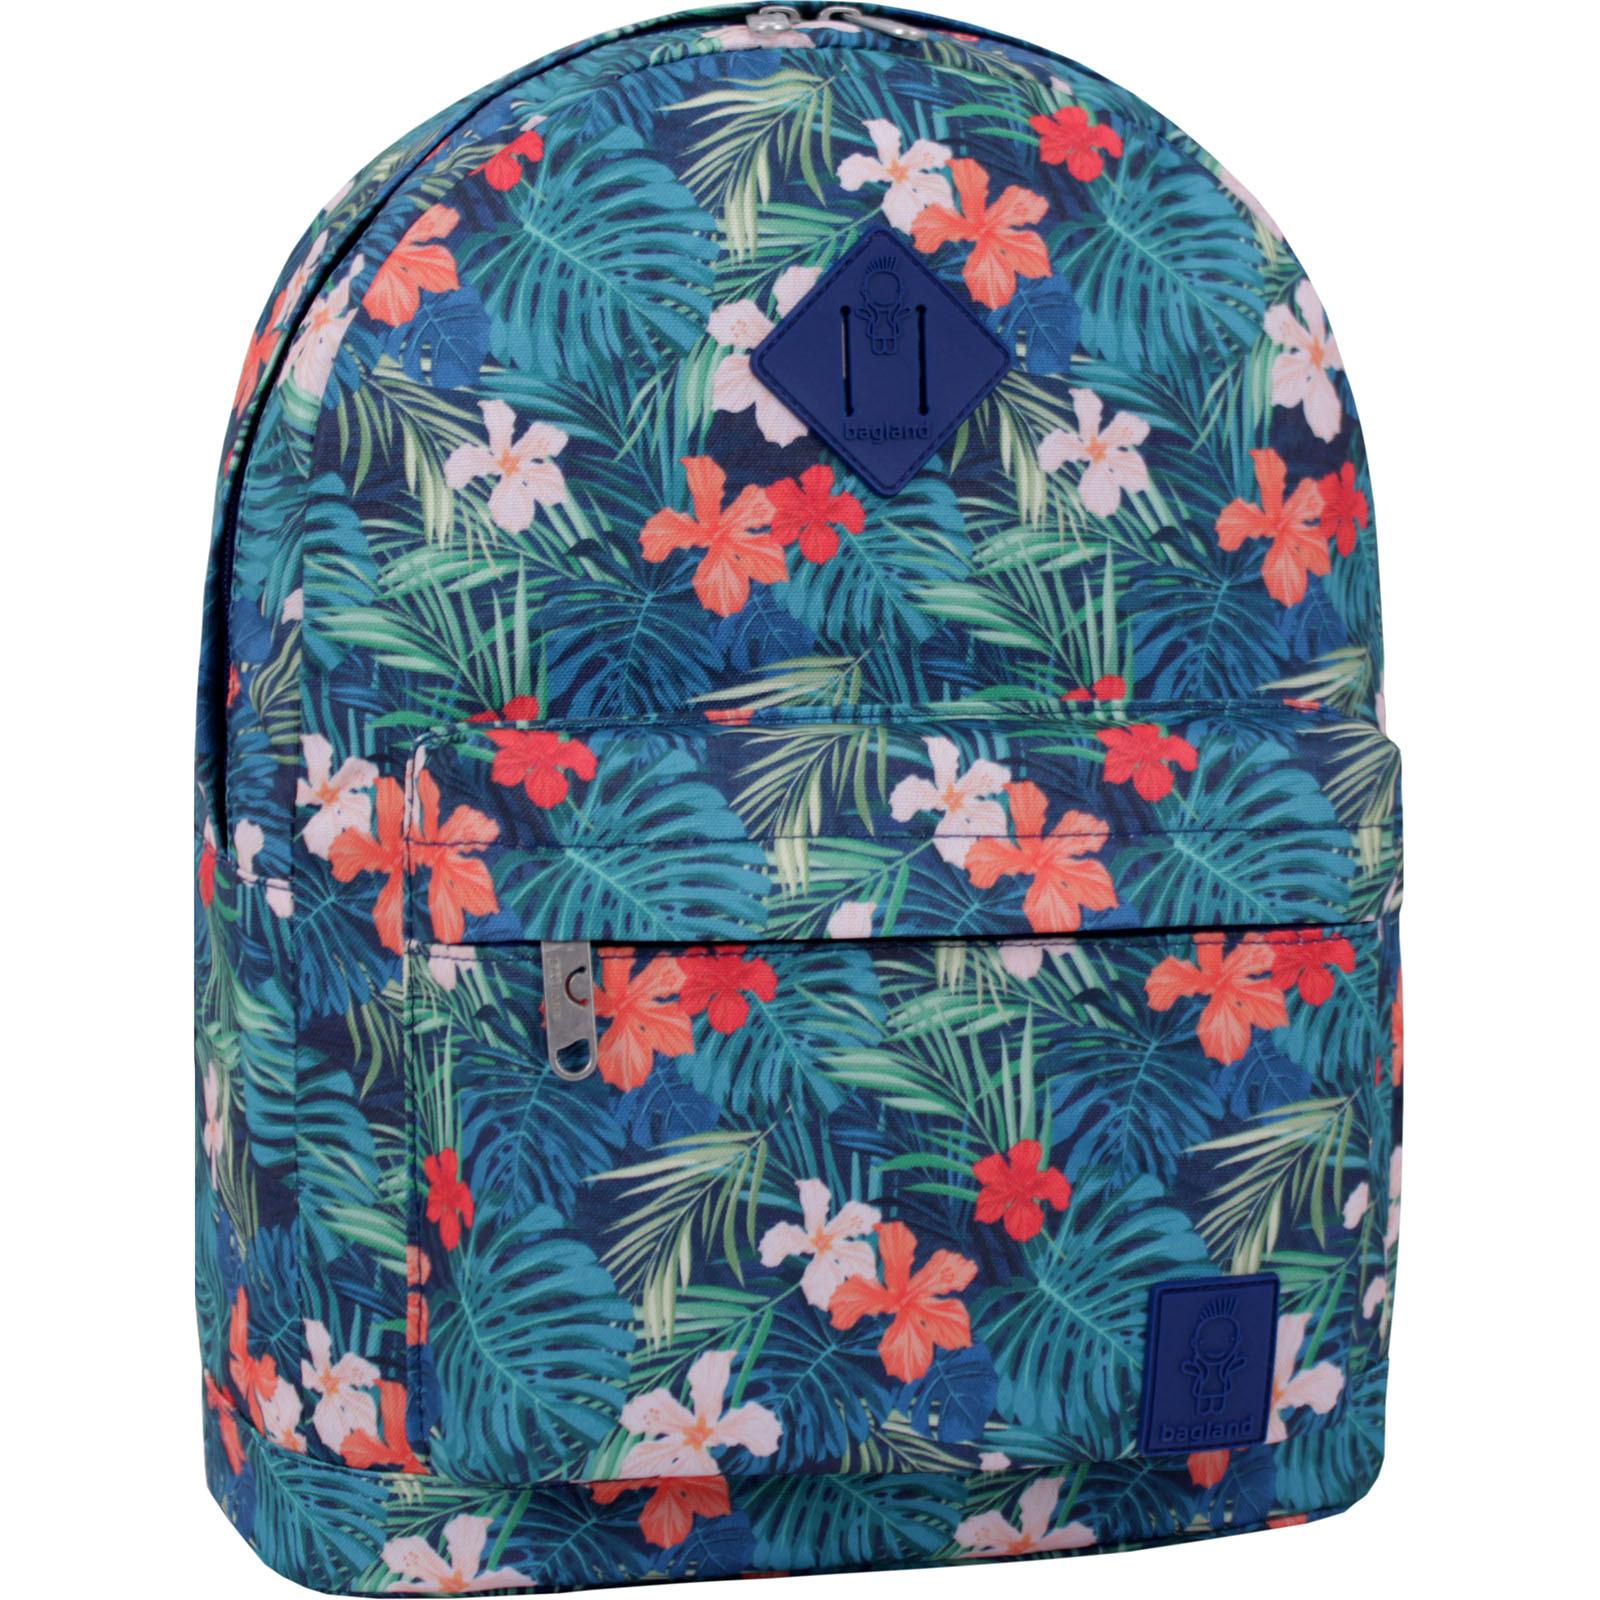 Городские рюкзаки Рюкзак Bagland Молодежный 17 л. сублімація 128 (00533664) IMG_4639_суб.128_.JPG